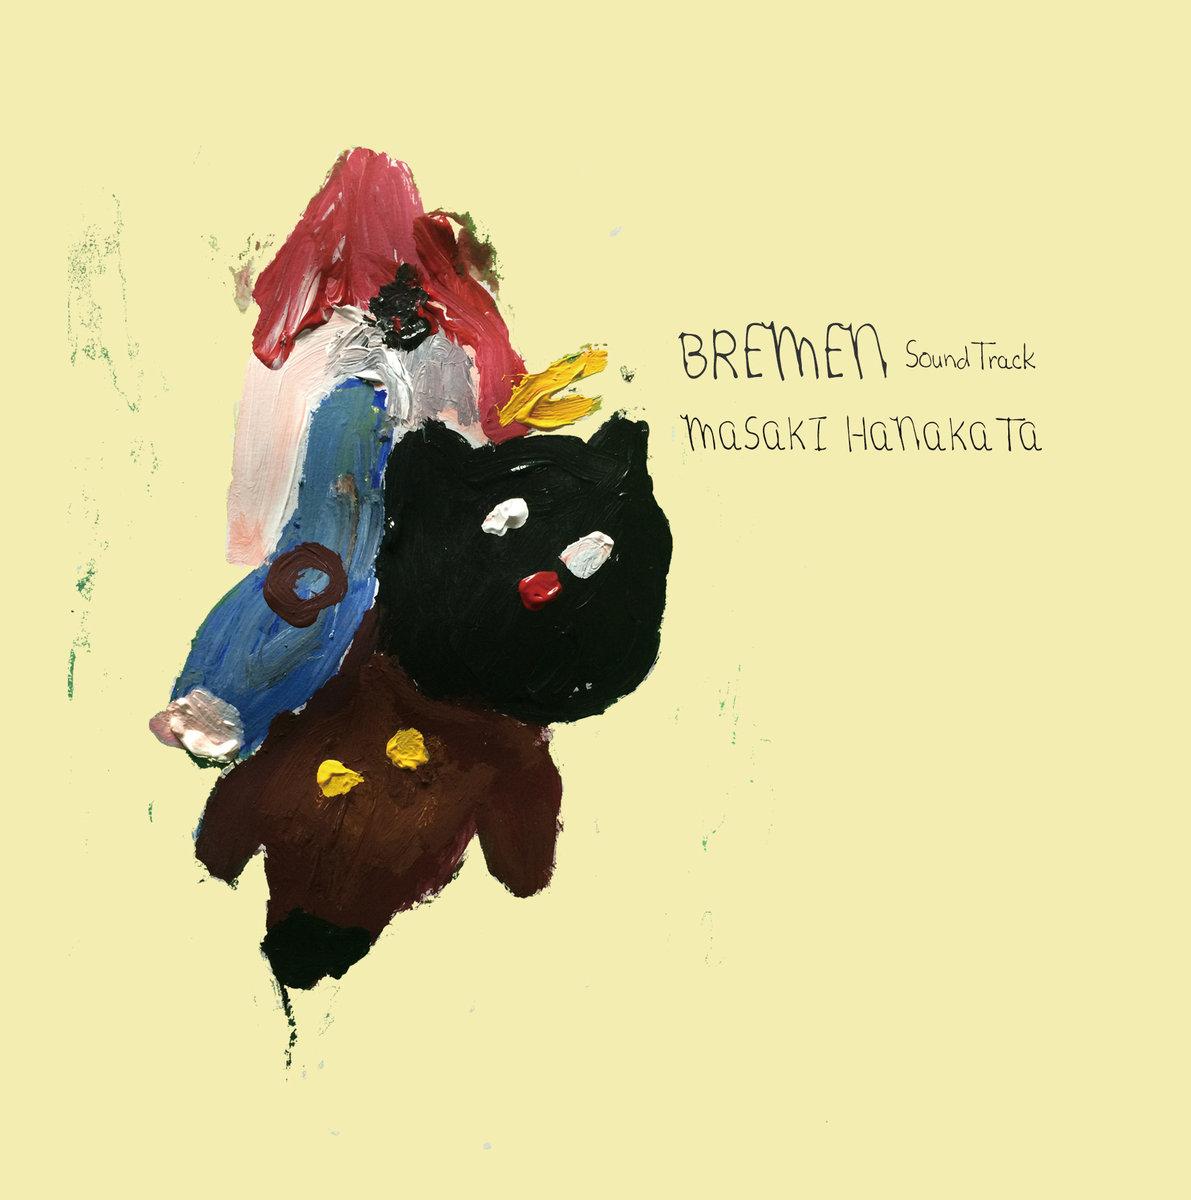 Masaki Hanakata – Bremen soundtrack